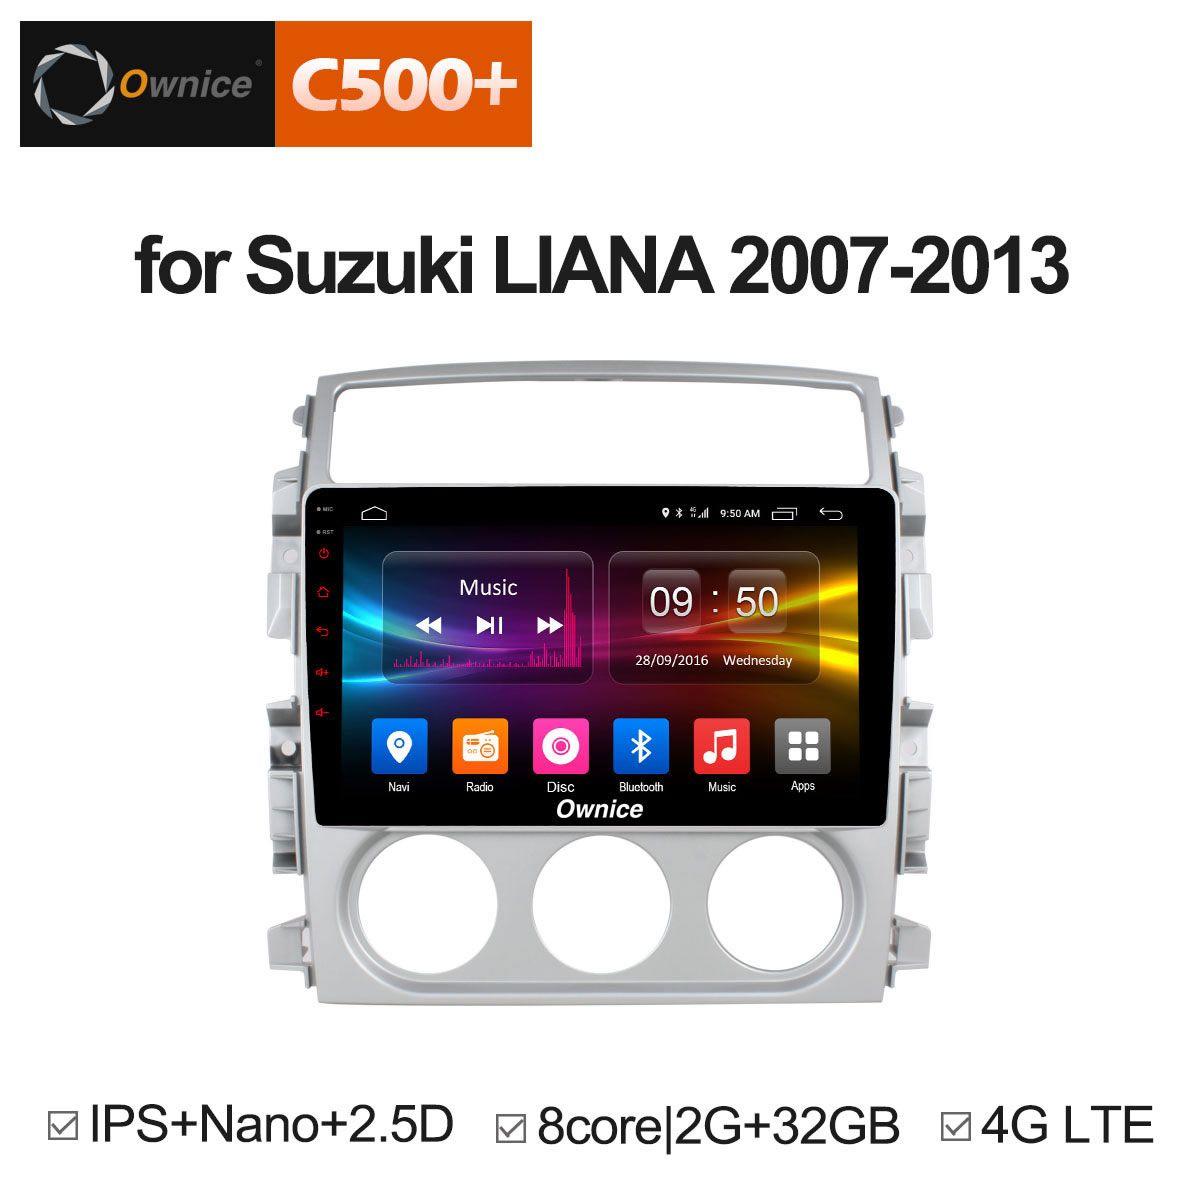 Ownice C500+ G10 Octa Core 2G+32G Android 8.1 Car dvd Stereo player for Suzuki Liana 2007 - 2013 radio Head Unit DAB+ 4G SIM